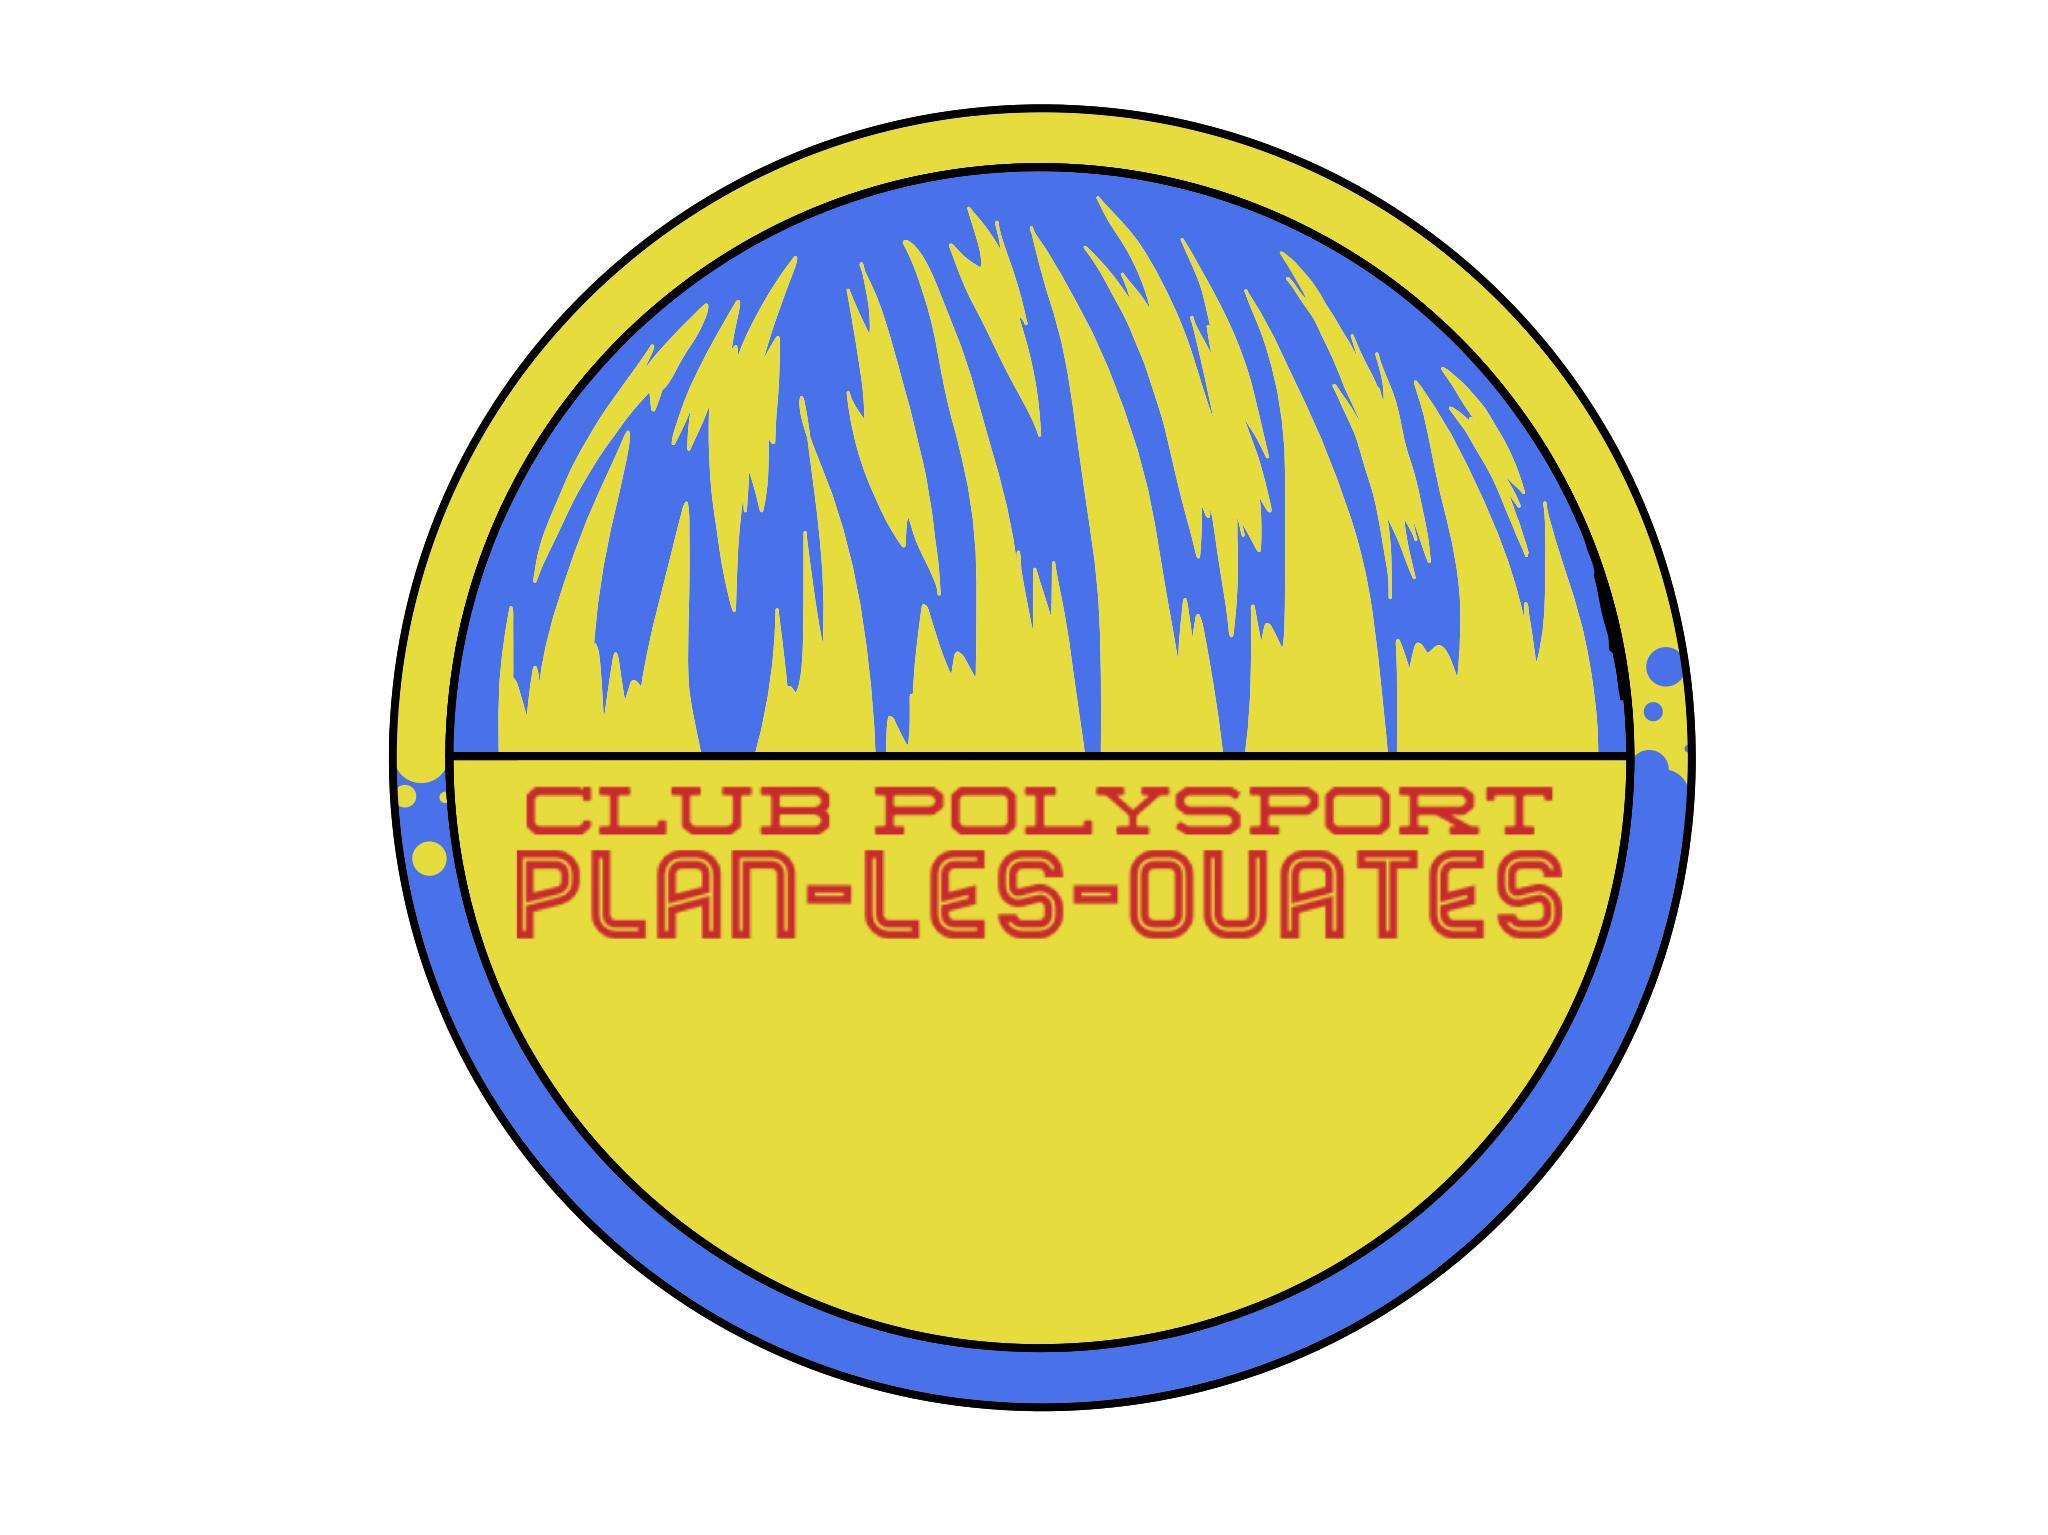 Club Polysport Plan-les-Ouates